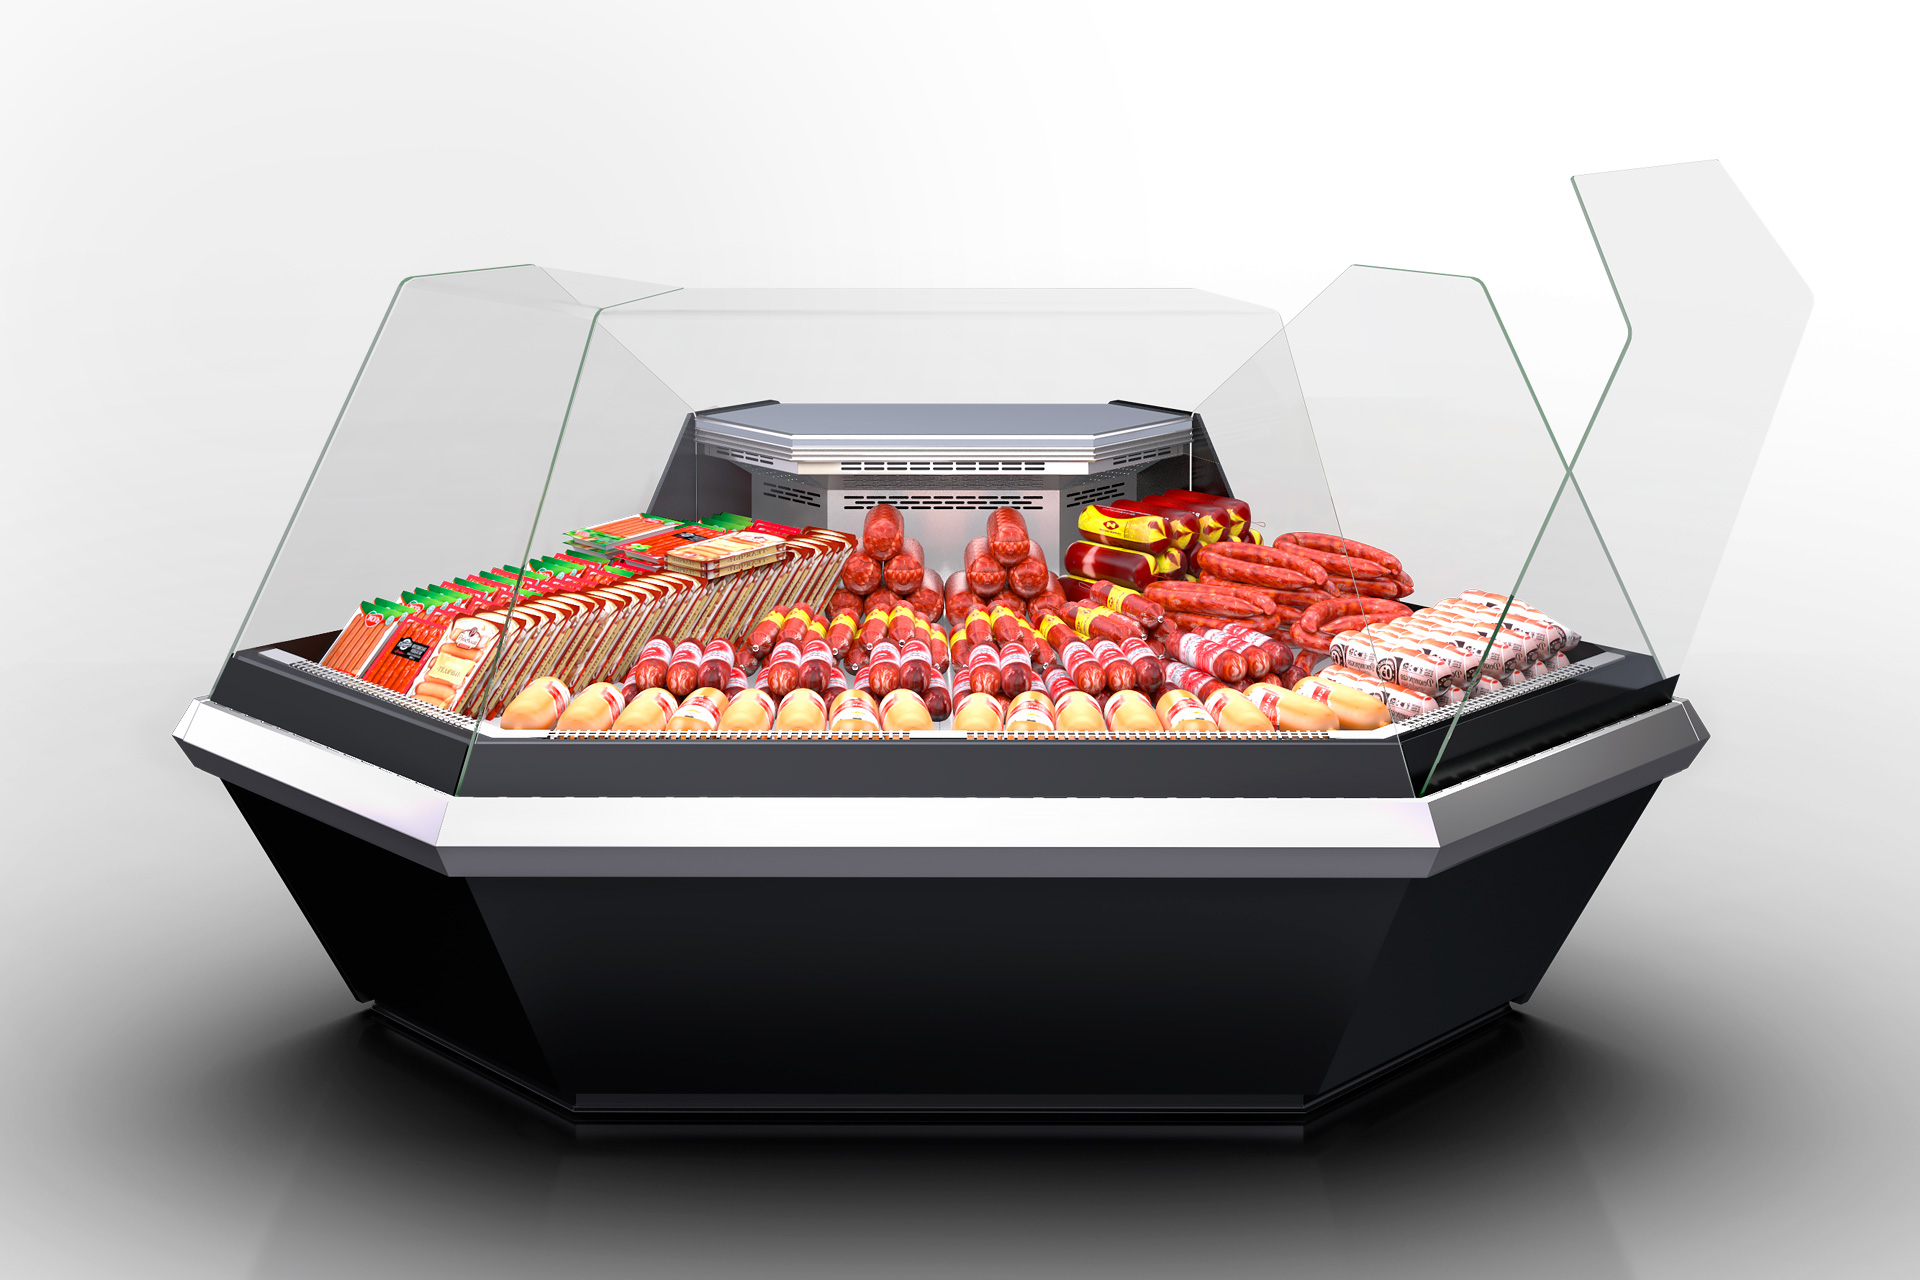 Angular elements of refrigerated counters Missouri enigma MK 120 deli OS 120-DLM-ES90